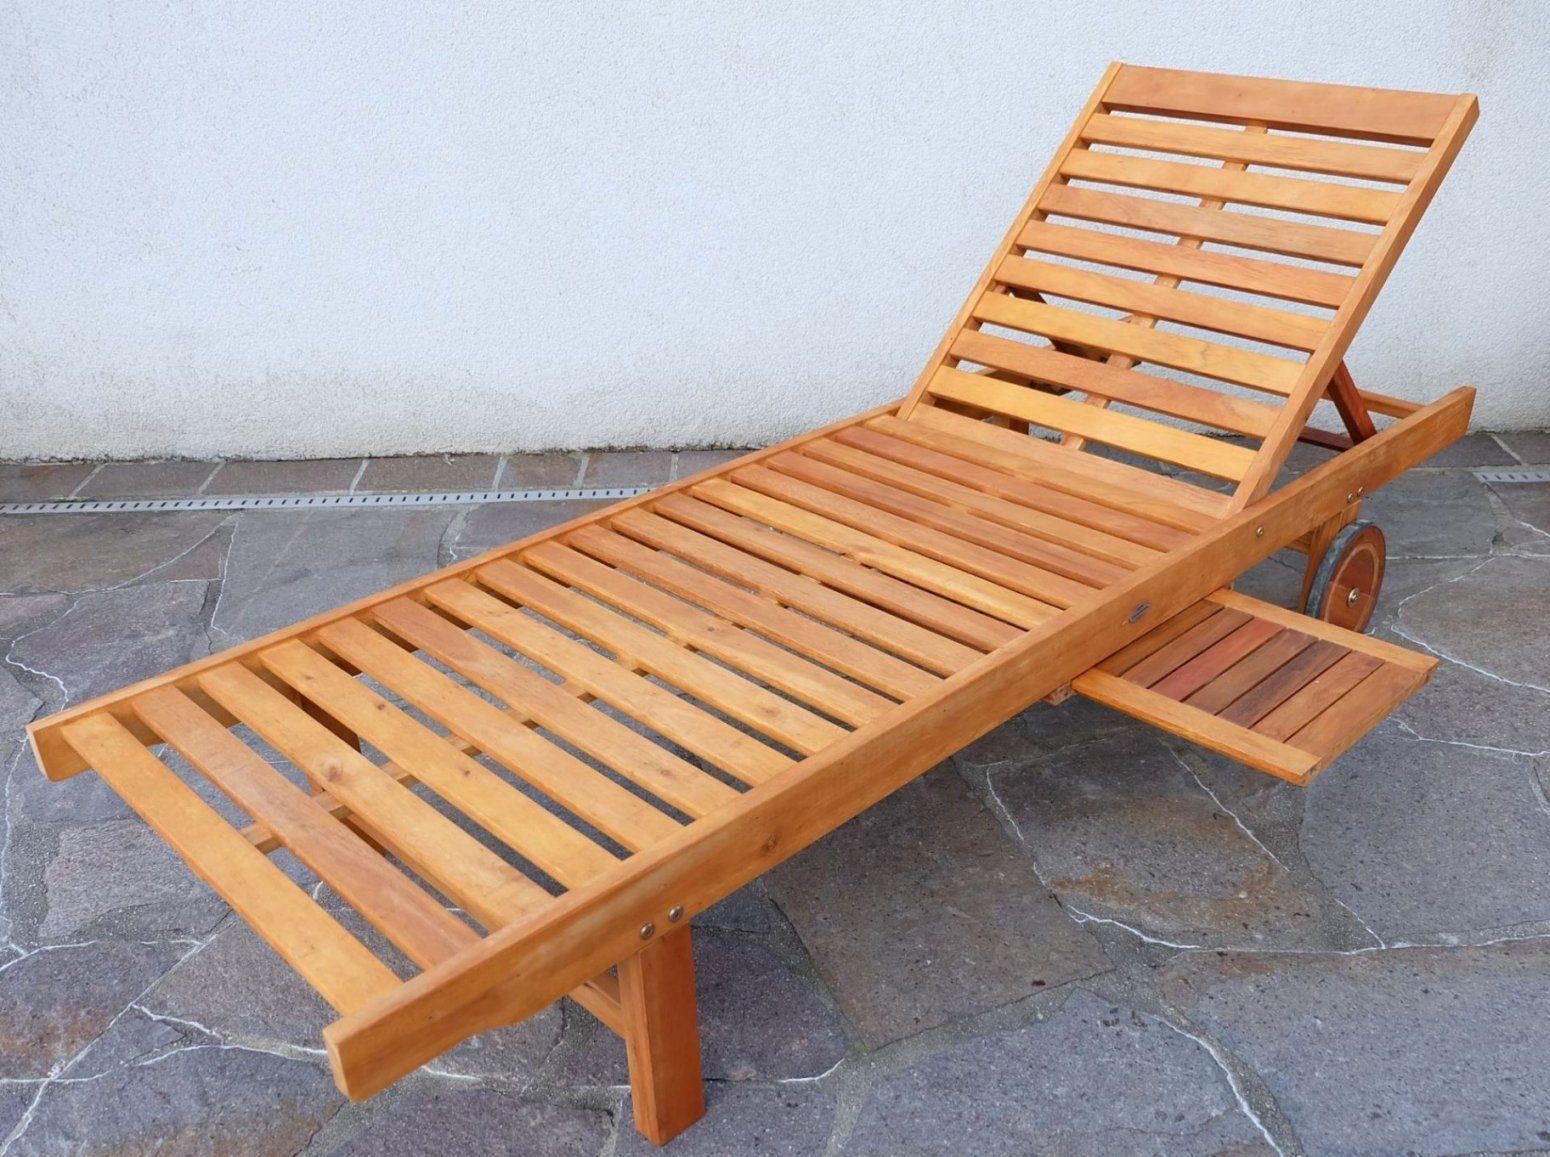 Genial Genial Sonnenliege Holz Selber Bauen Zum Gartenliege Holz von Sonnenliege Holz Selber Bauen Photo